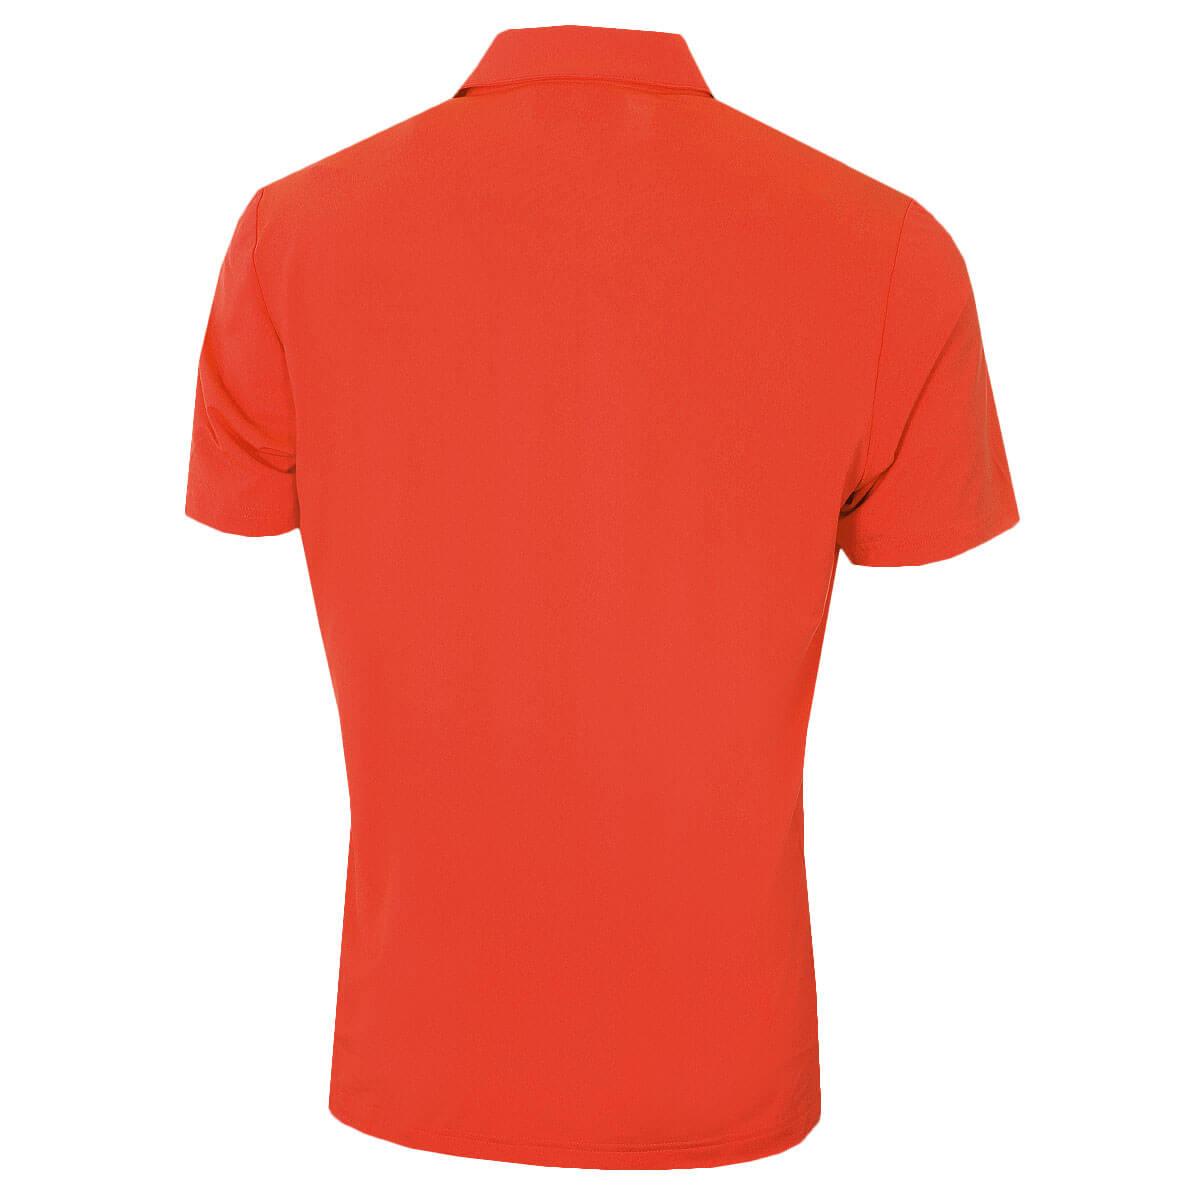 Adidas-Golf-Men-039-s-Ultimate-2-0-Solid-Crestable-Polo-Shirt thumbnail 17